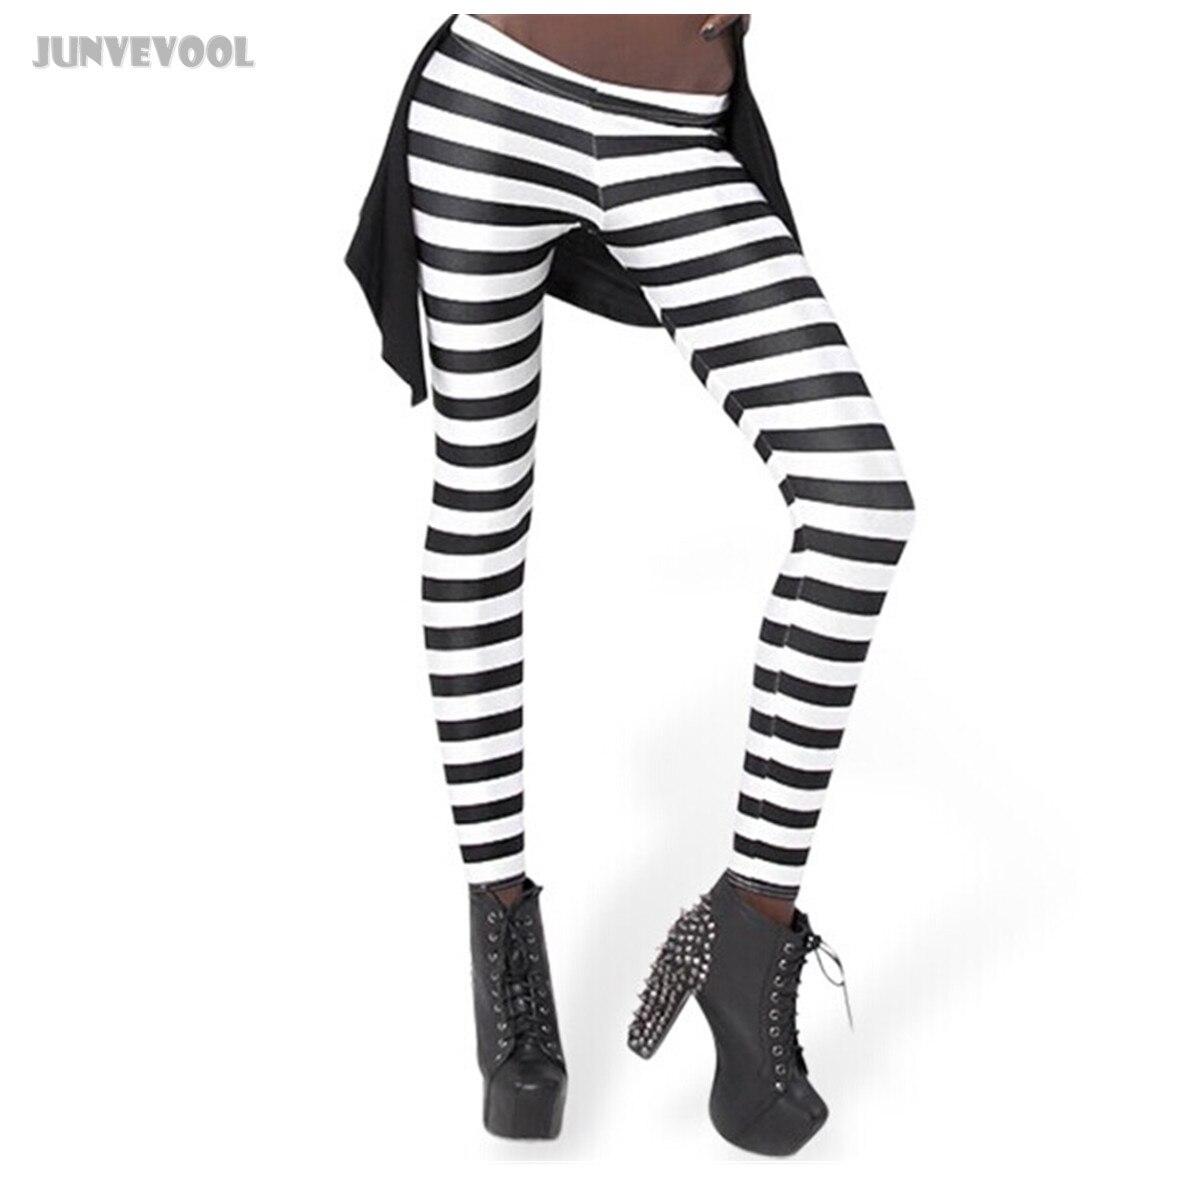 Fitness Wear for Women 3D Zebra Pattern Print Leggings Womens White Black Stripes Capris Ladies Girl Seamless Stretch Pants